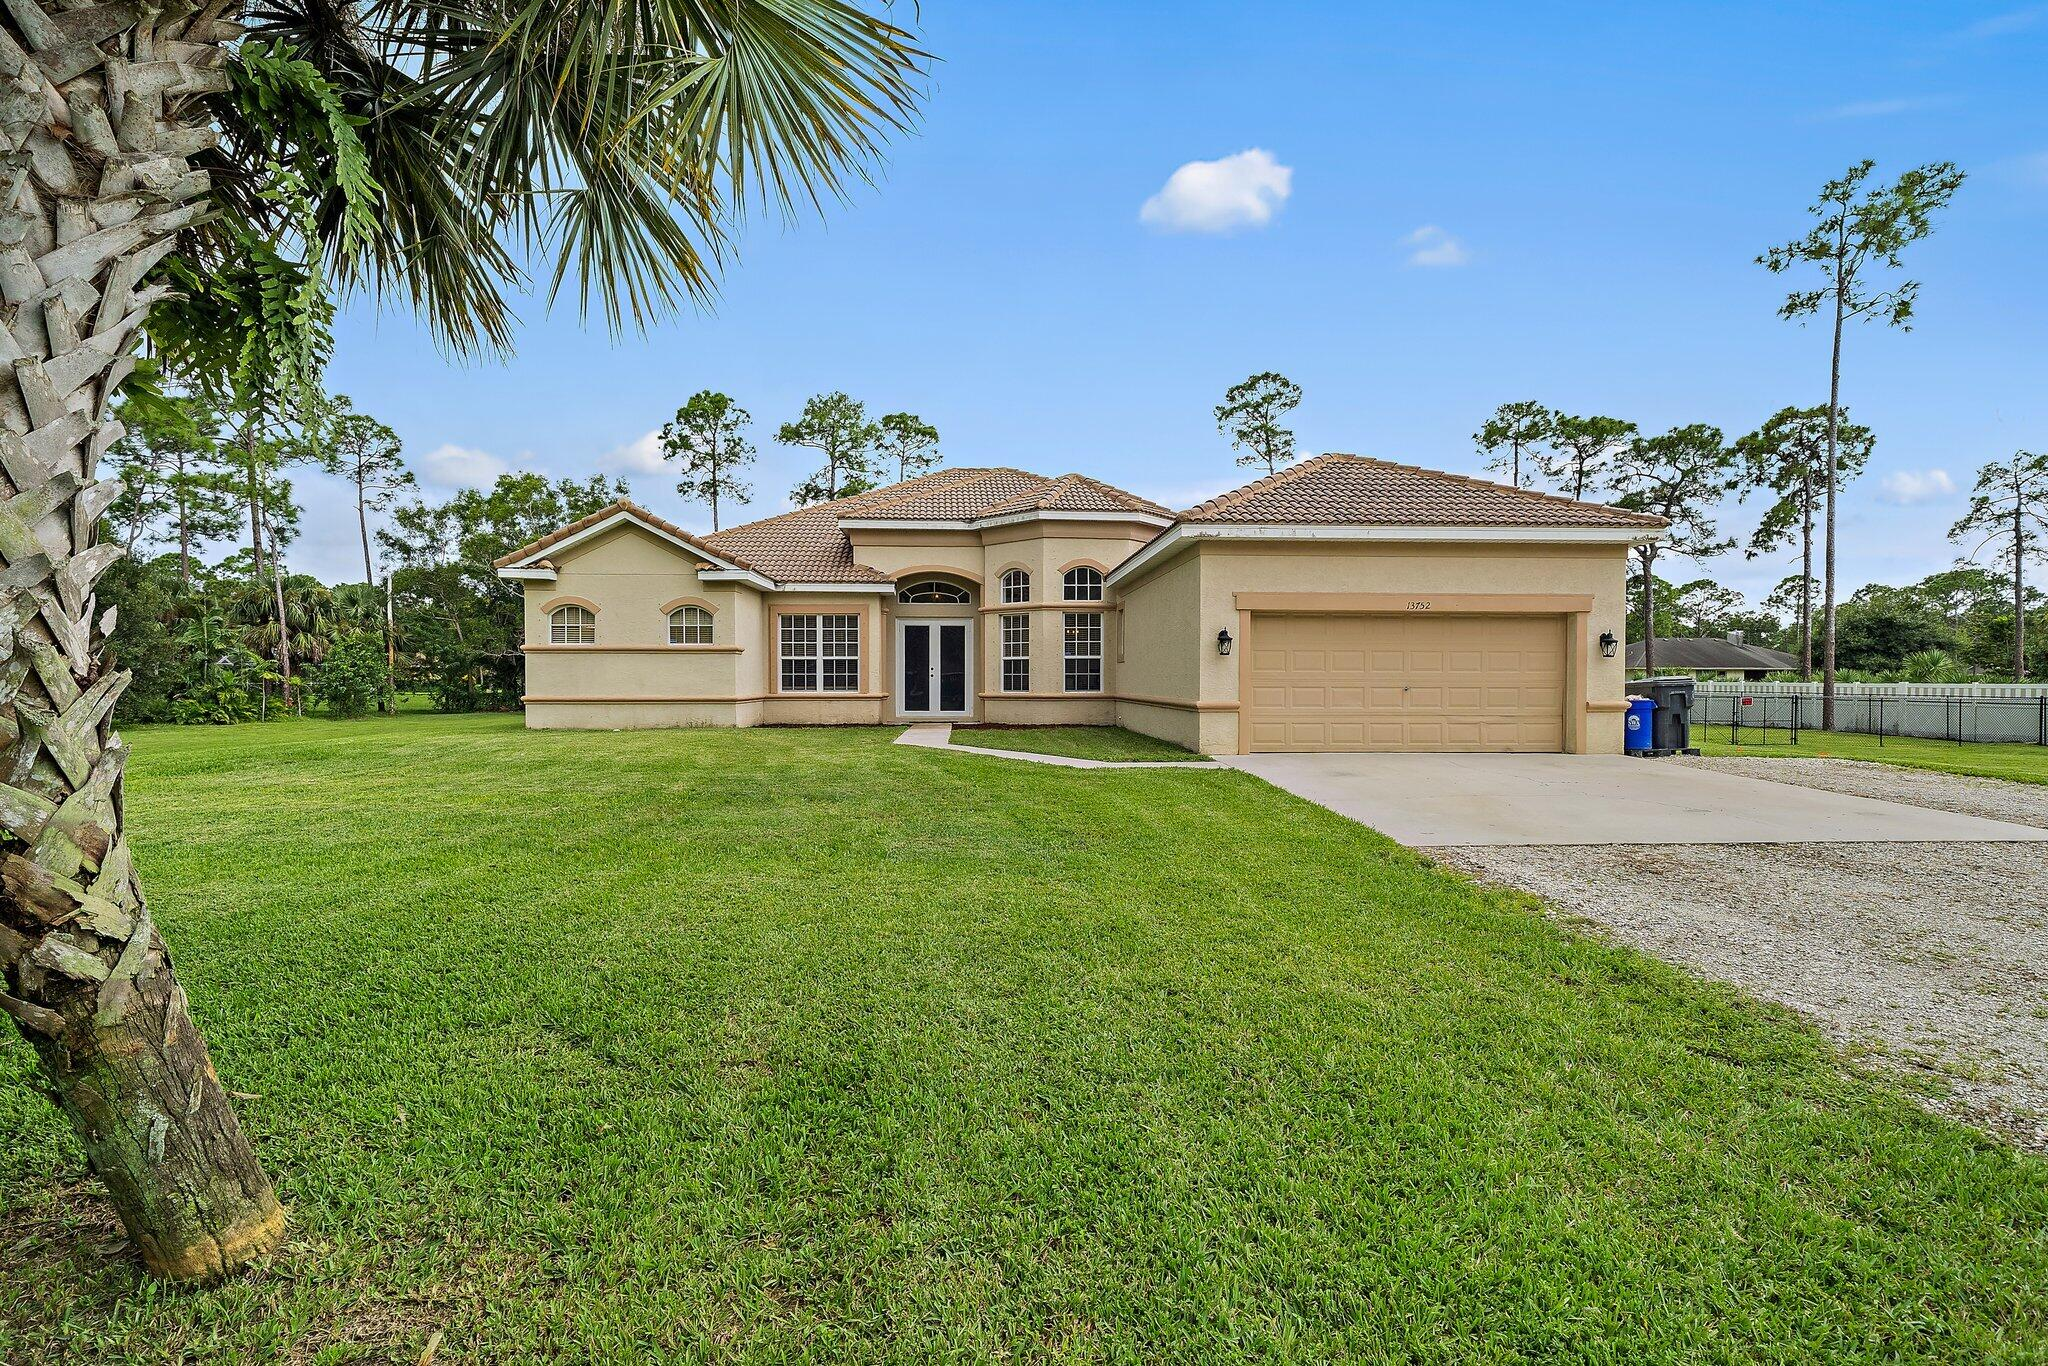 Home for sale in The Acreage, Loxahatchee, Royal Palm Beach Acreage West Palm Beach Florida